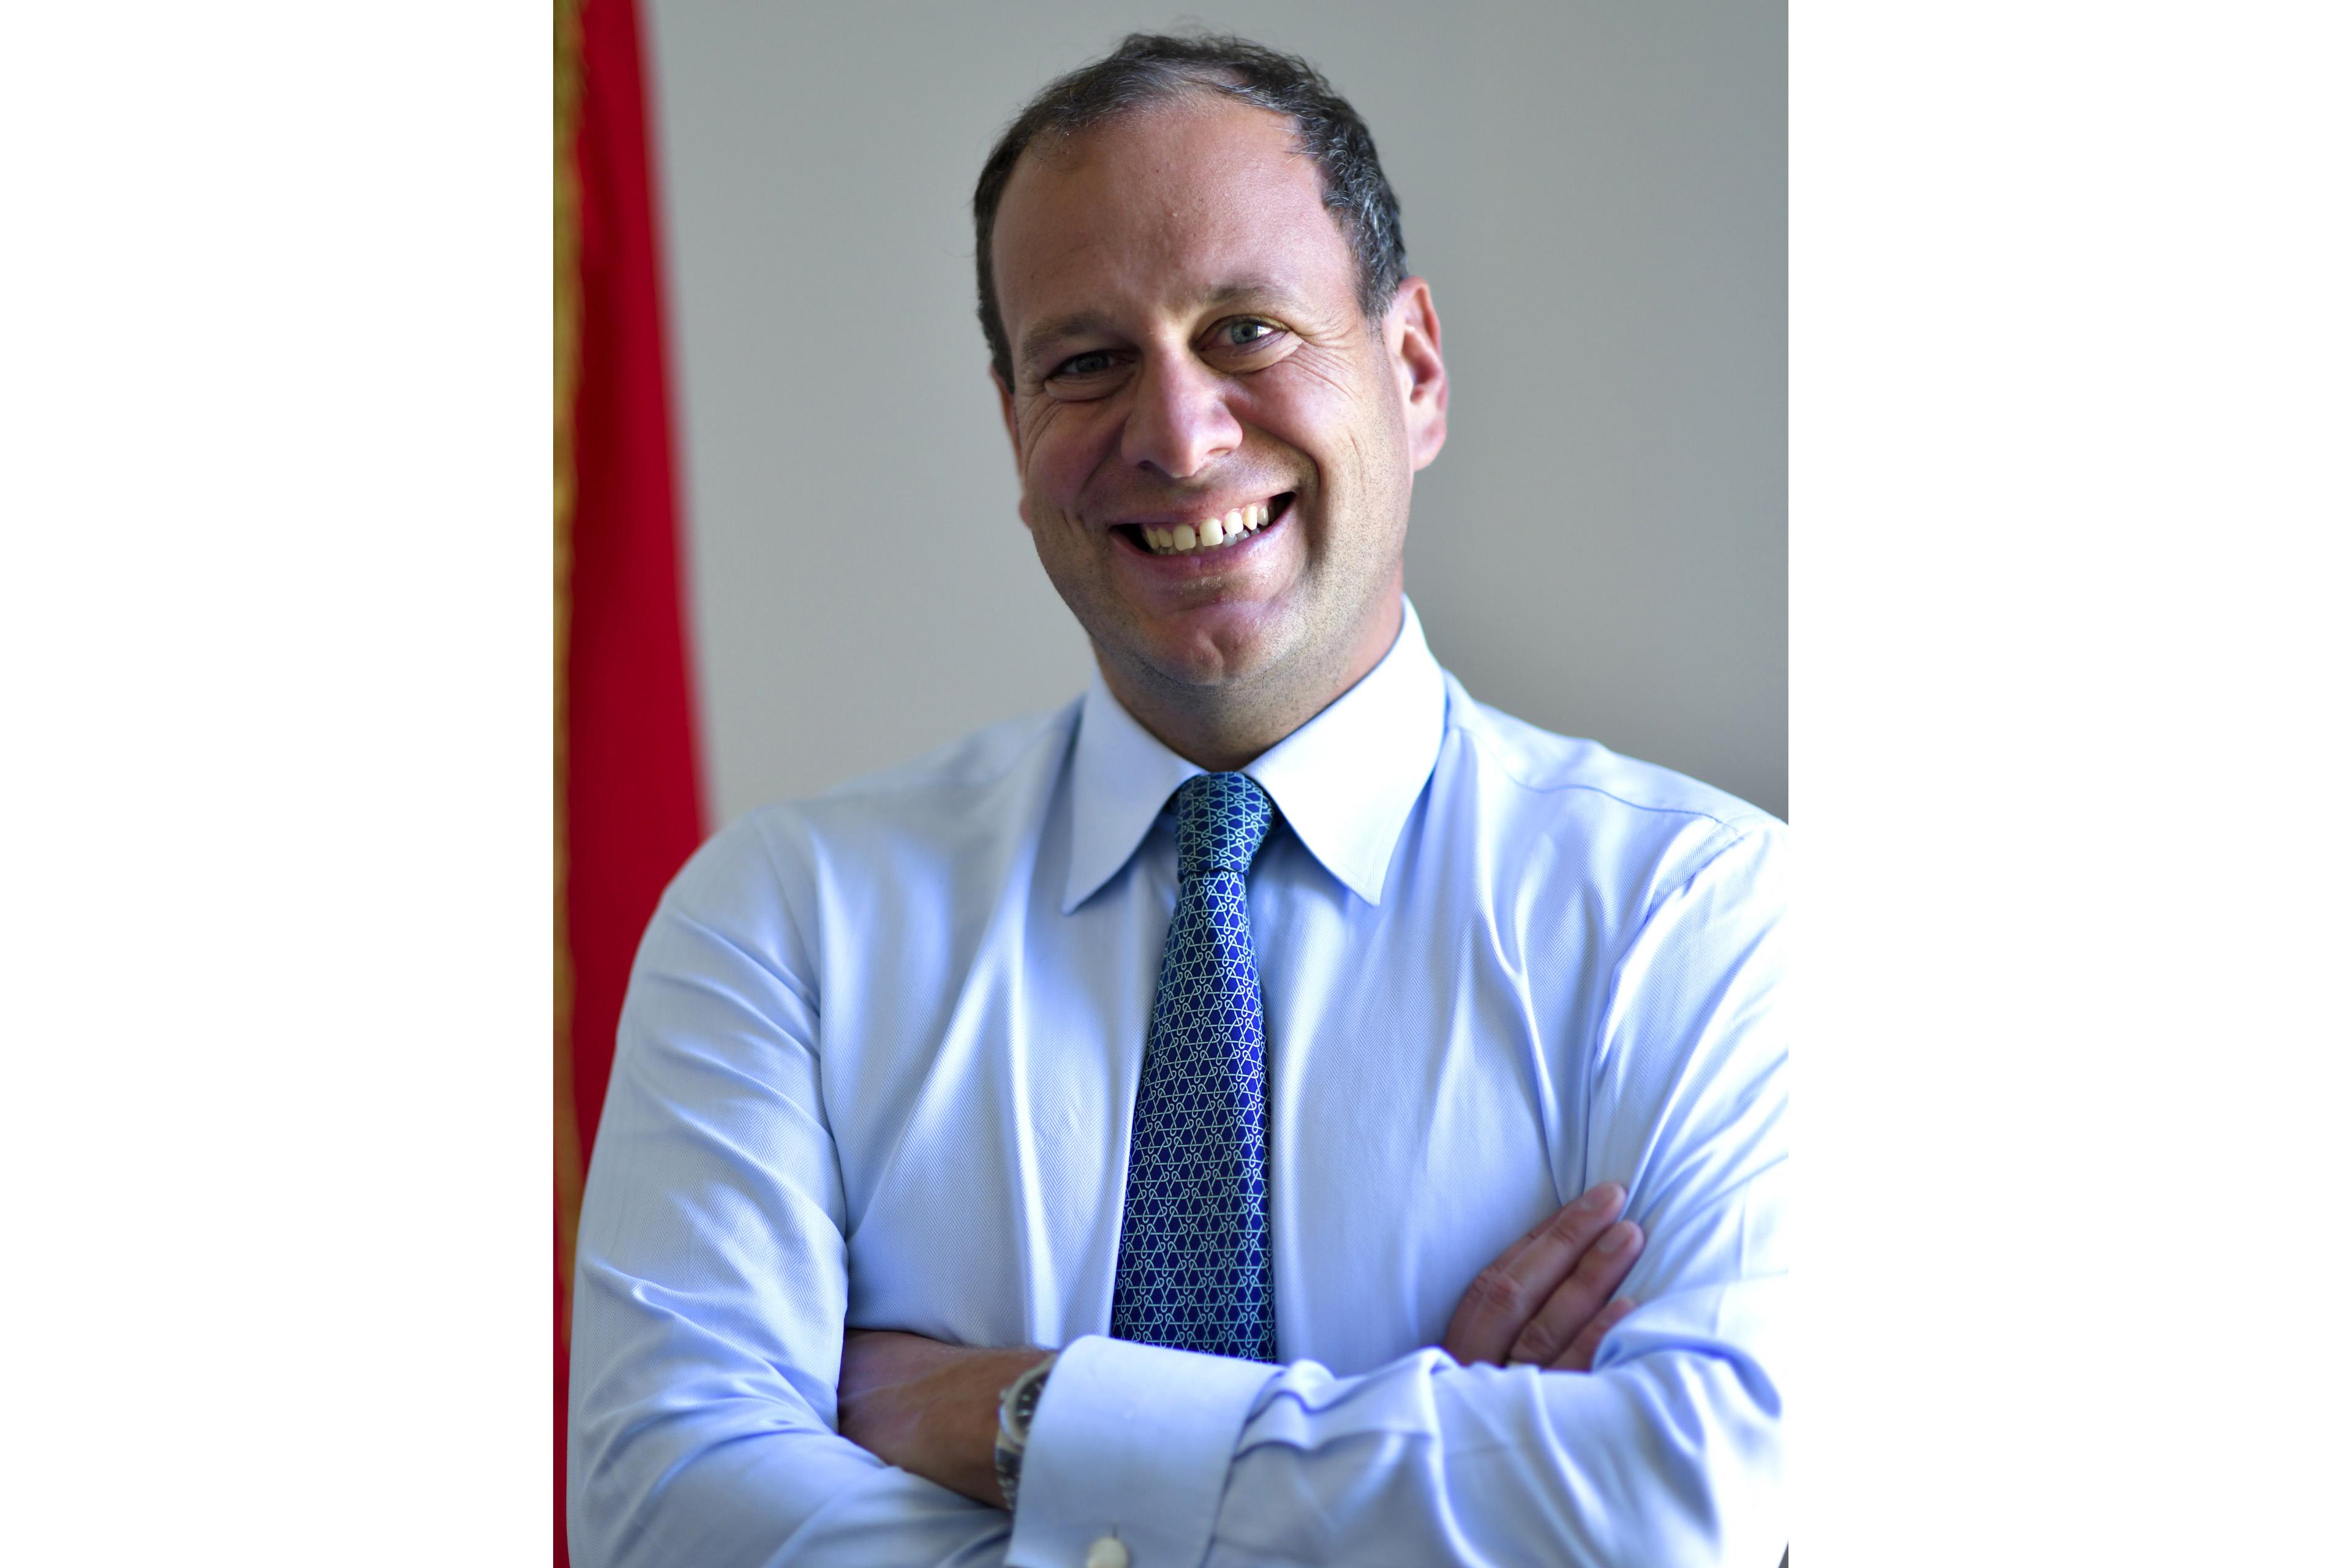 Frédéric Genta